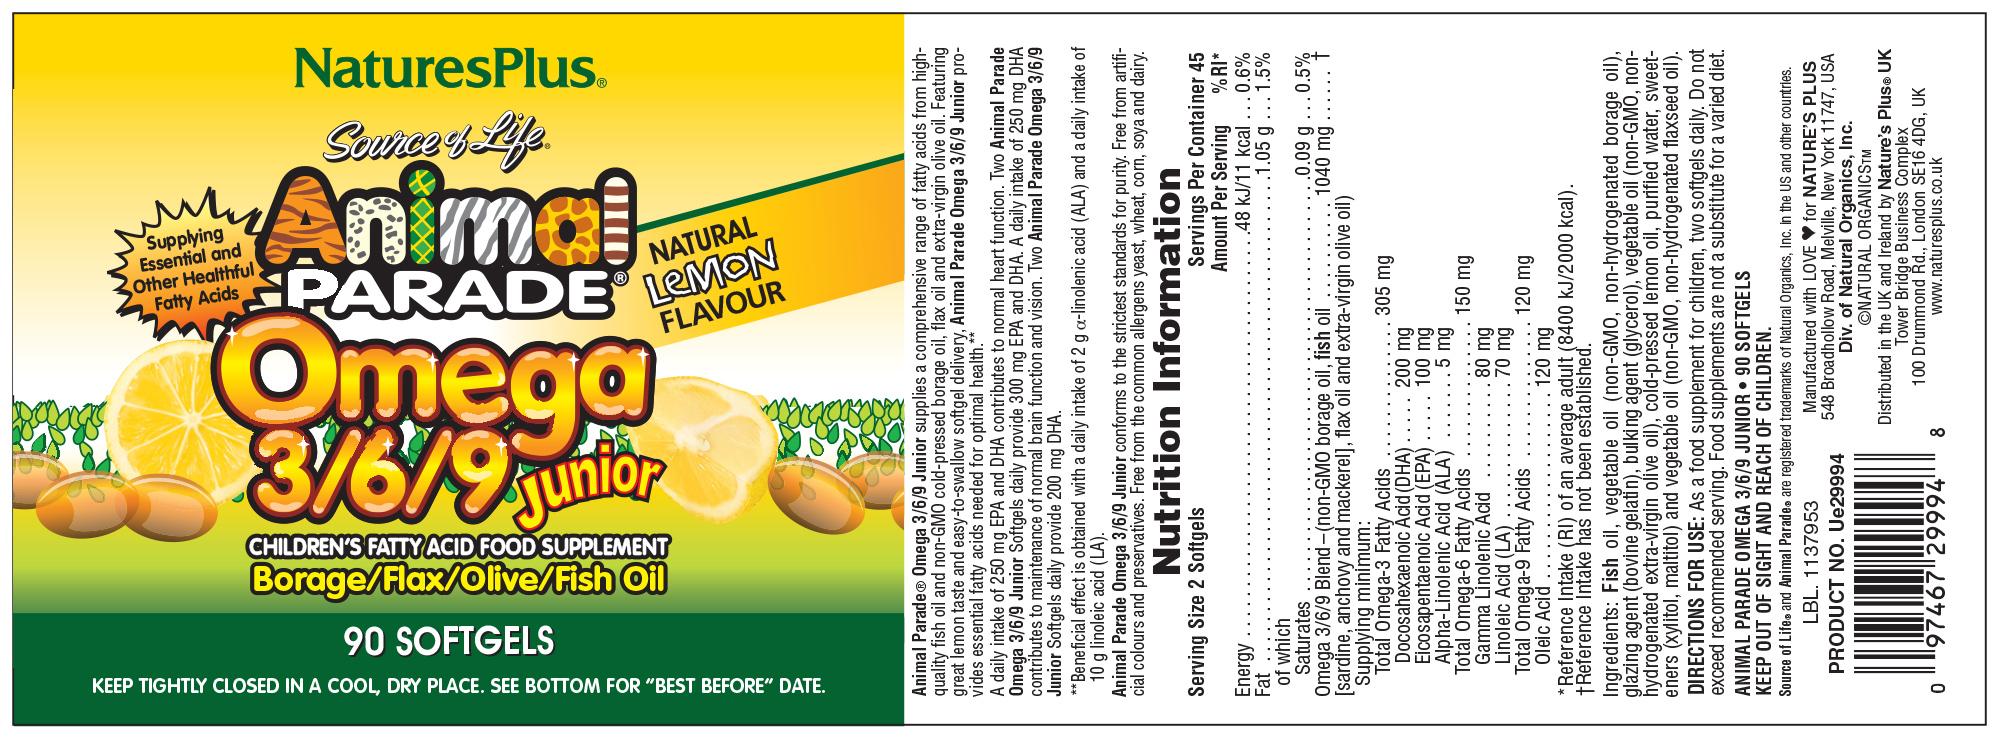 Source of Life Animal Parade Omega 3/6/9 Junior Natural Lemon Flavour 90's